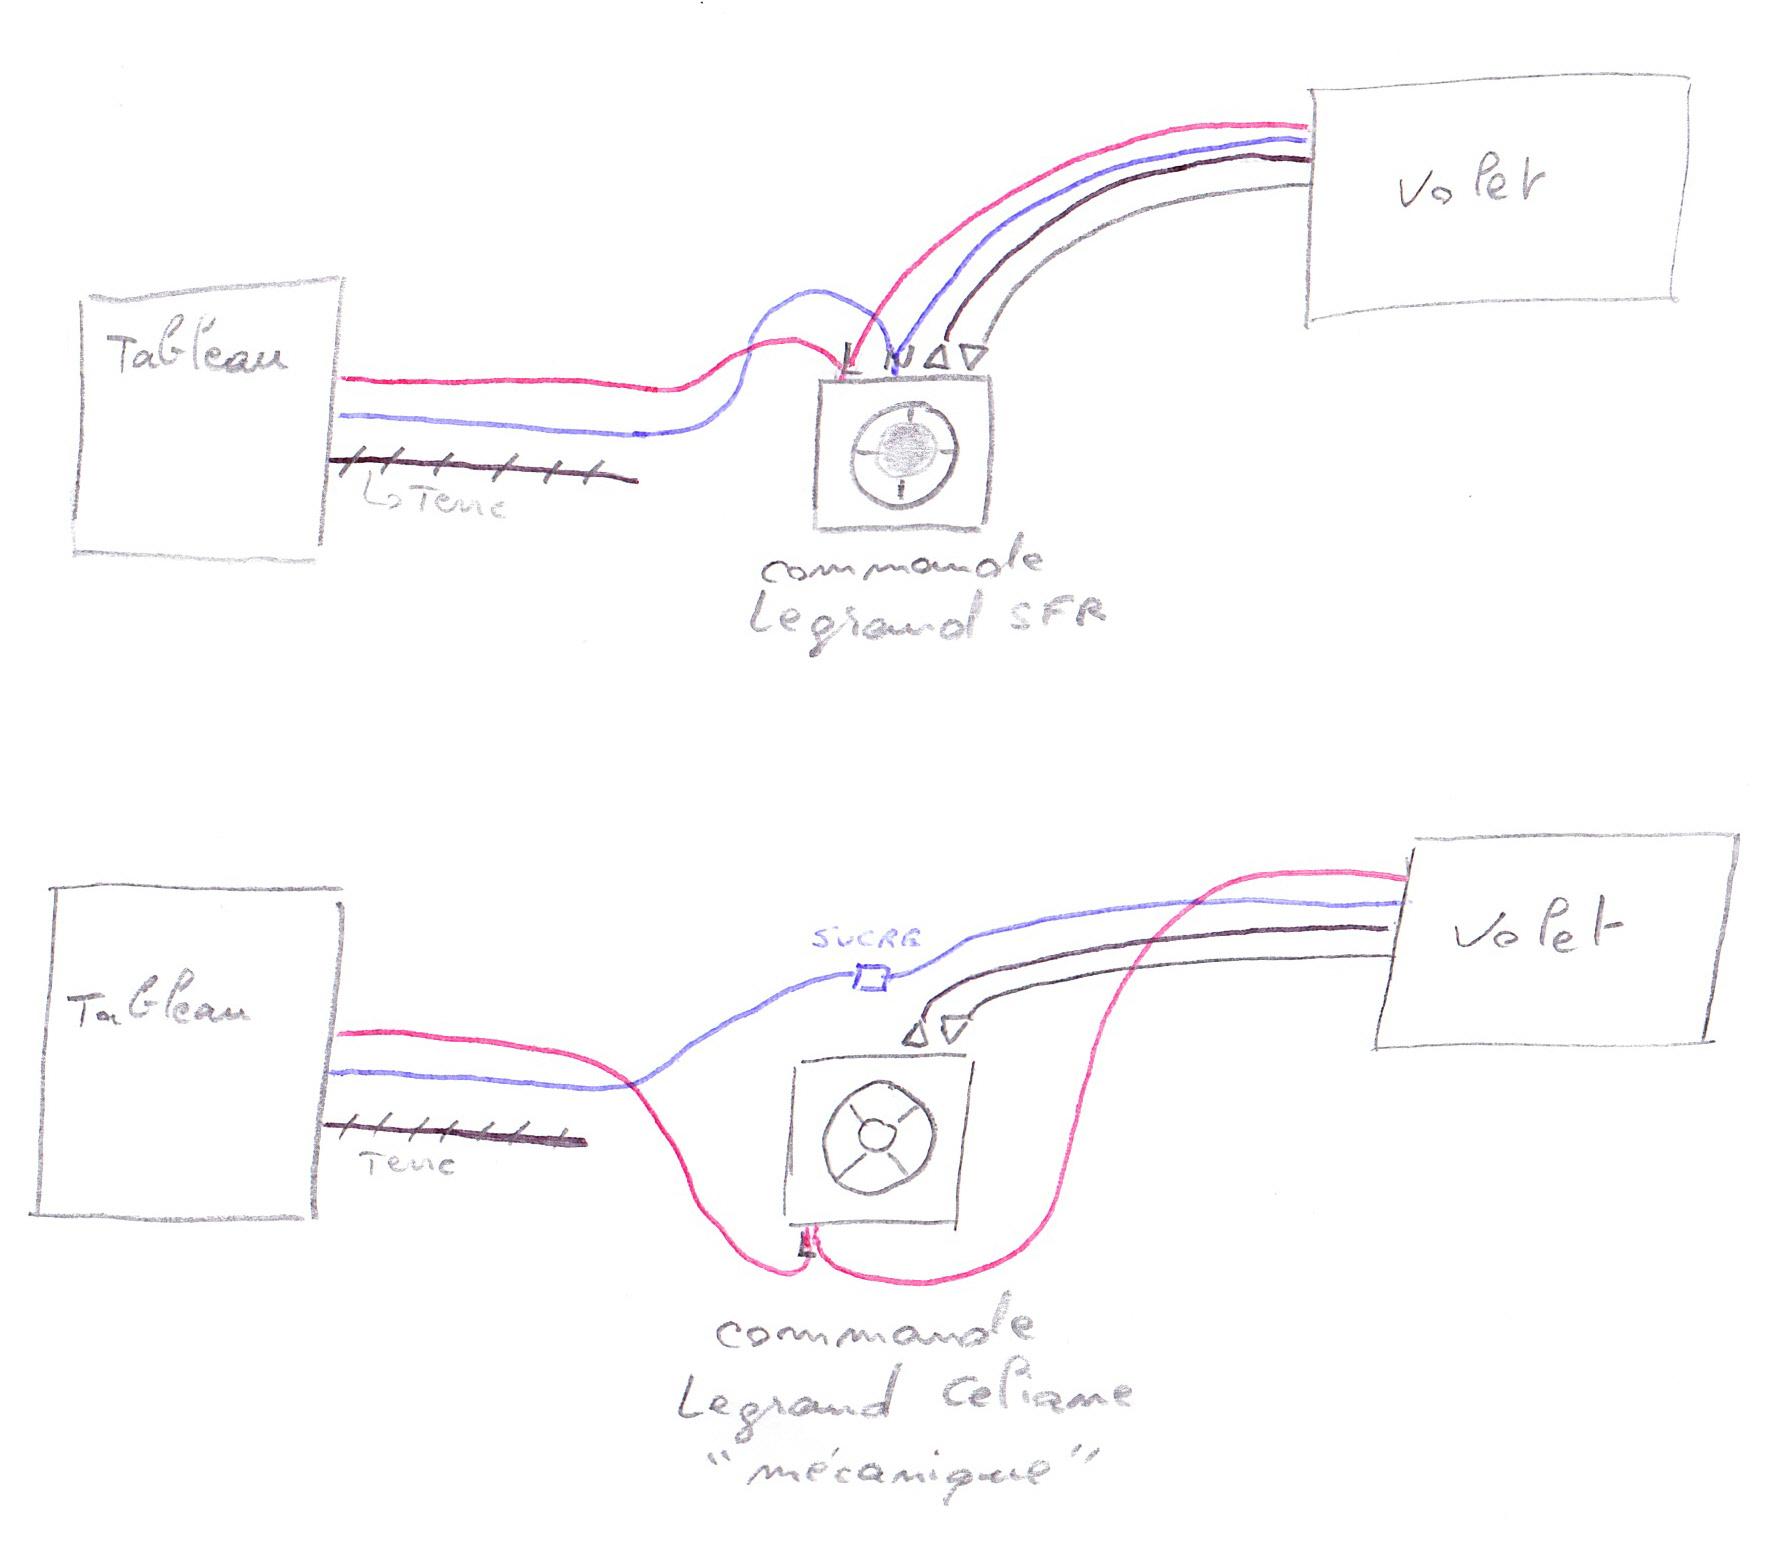 Installation electrique tertiaire schema